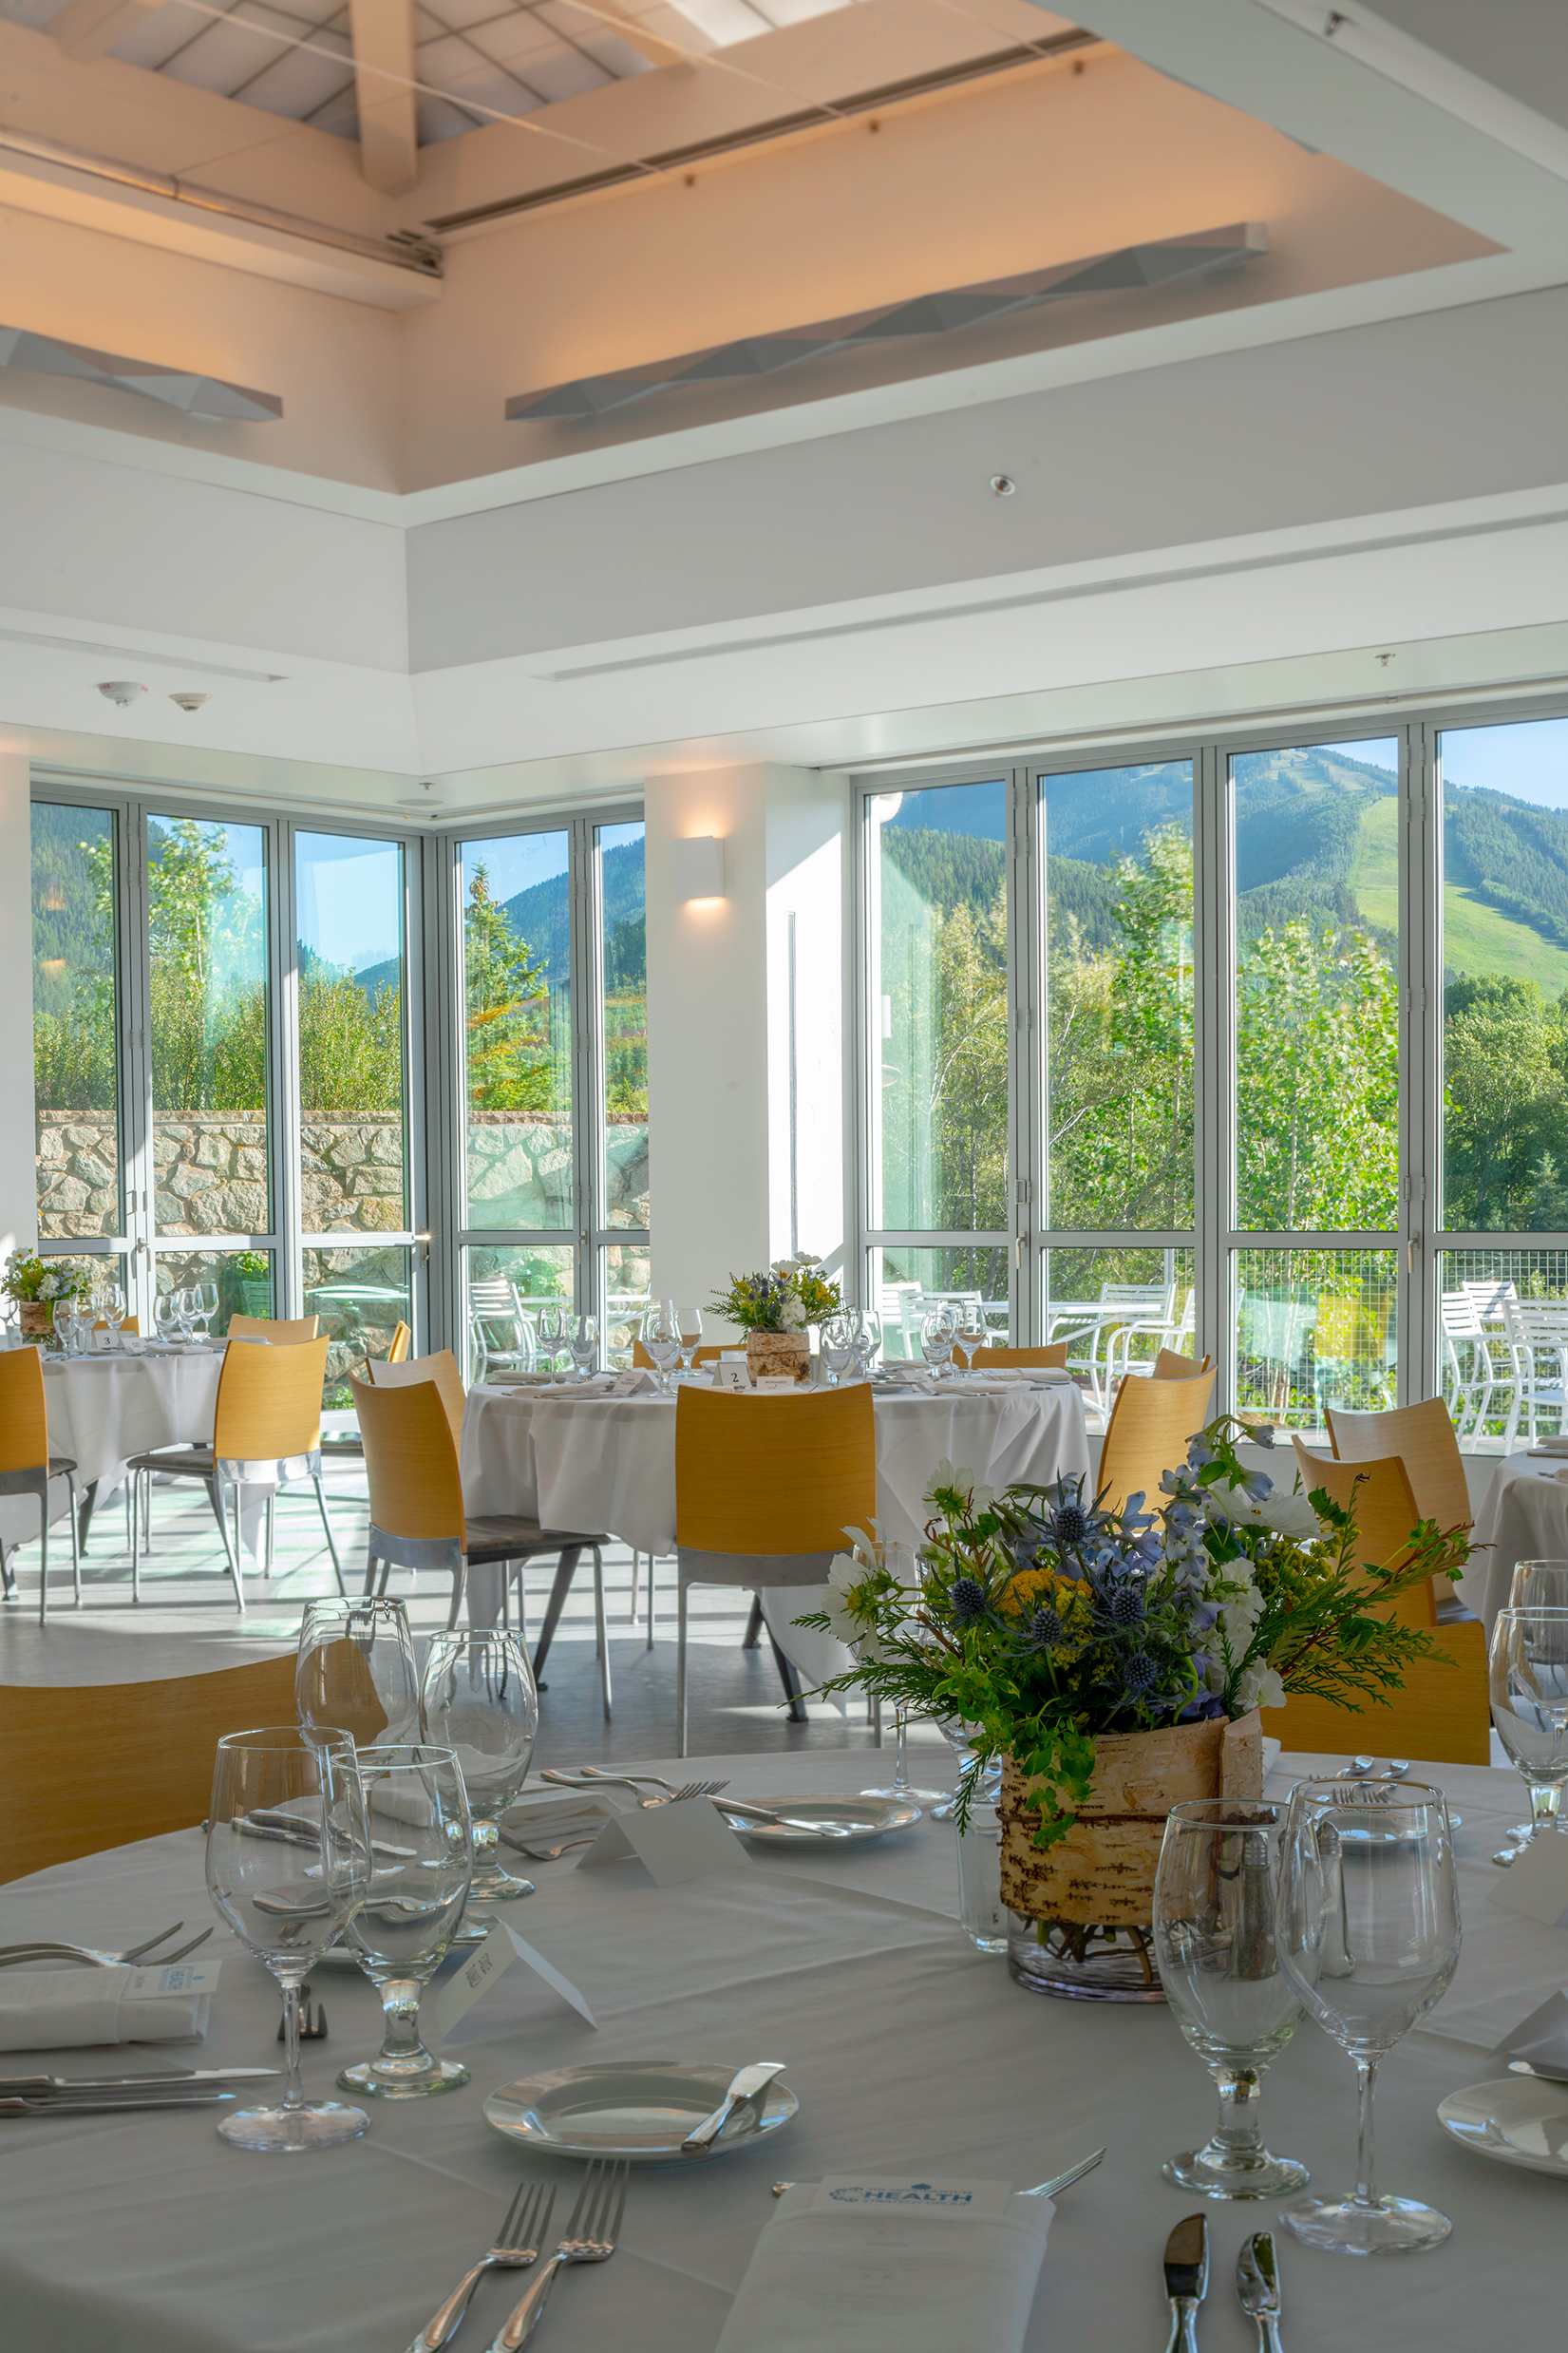 Aspen-Meadows-Reception-Pavilion-interior-(1).jpg